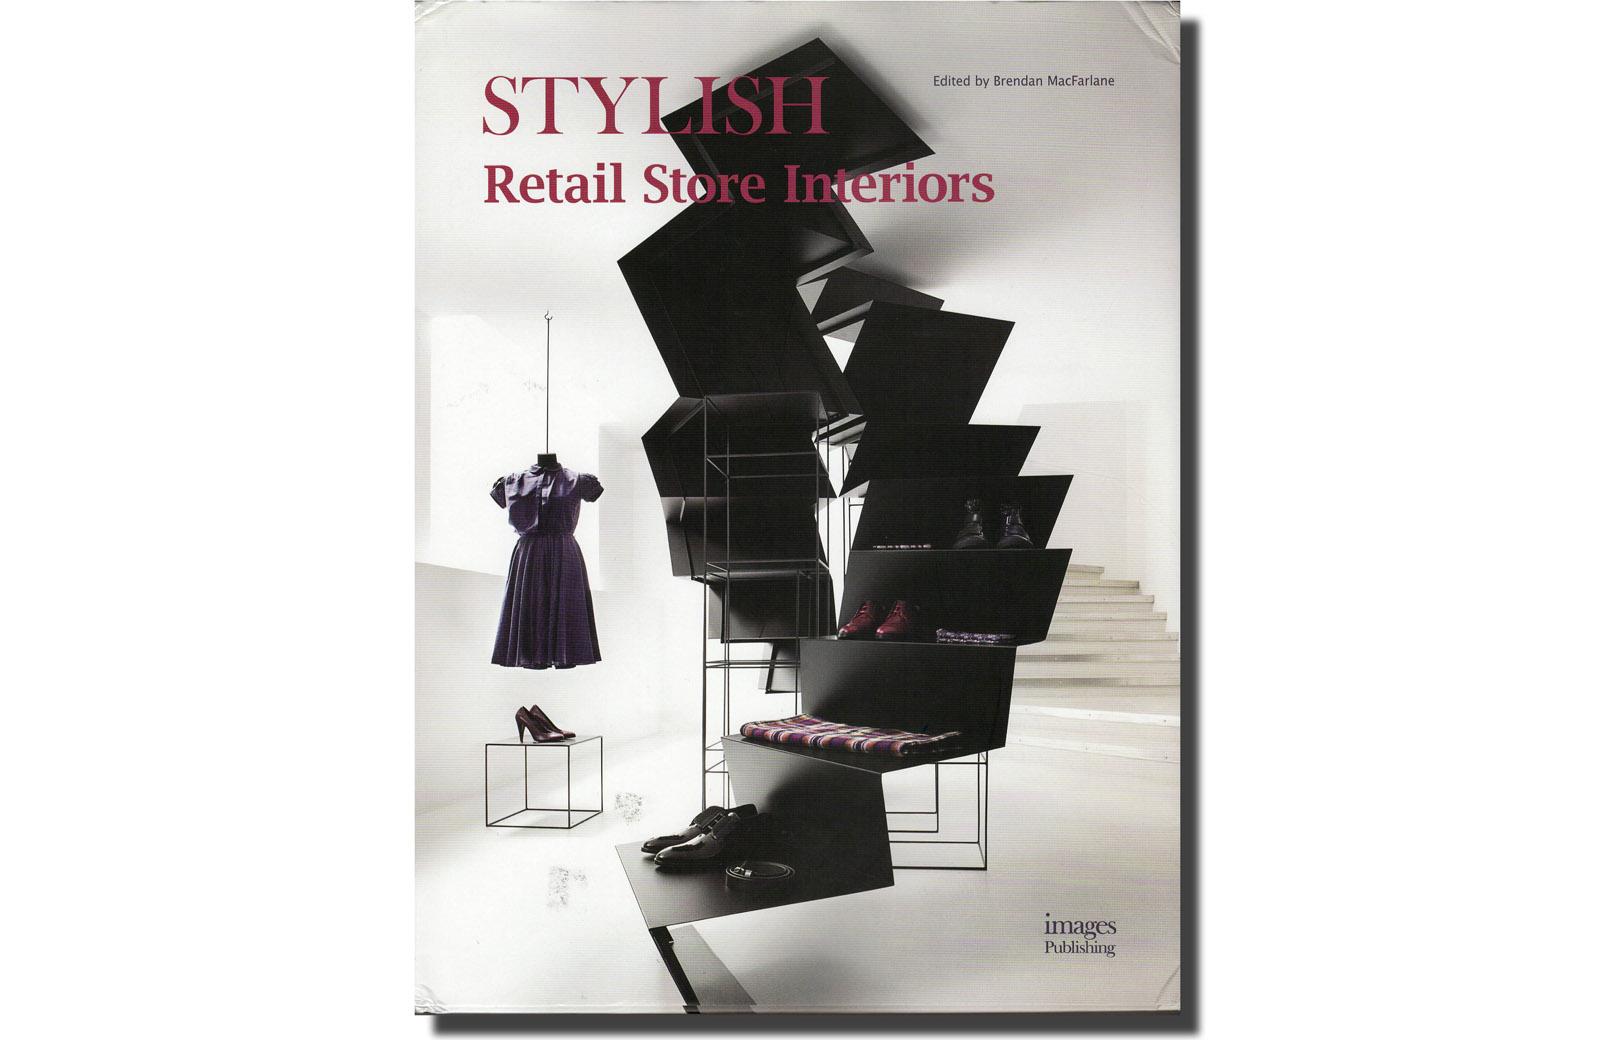 stylish-retail-store-interiors_miami_01